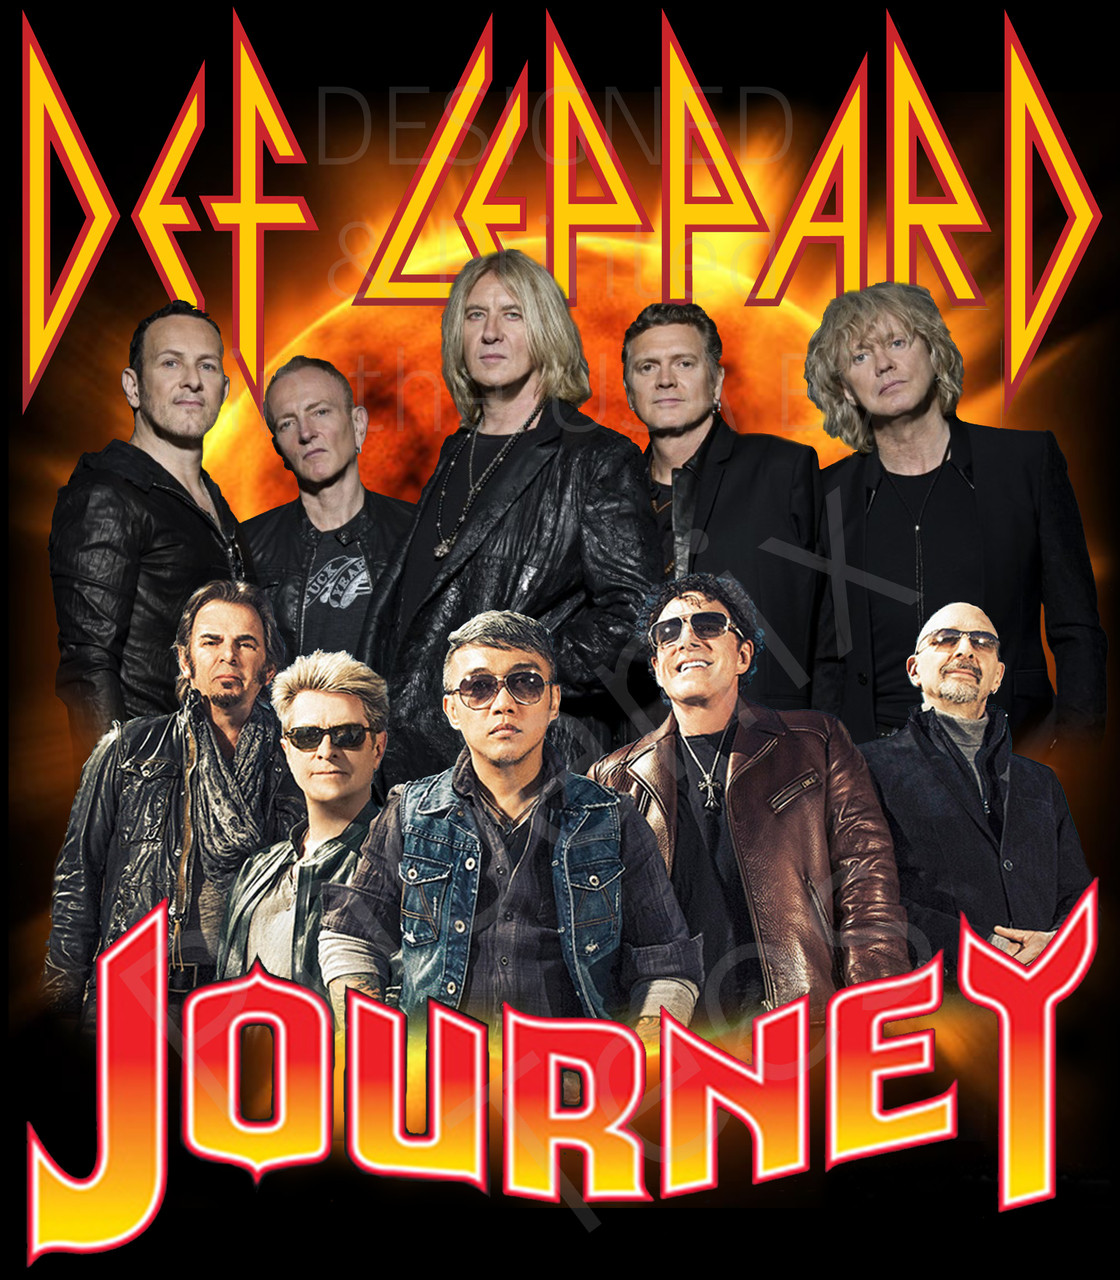 Def Leppard Journey Tour 2020.Def Leppard Journey 2020 Tour Shirts Tour 2020 Infiniteradio